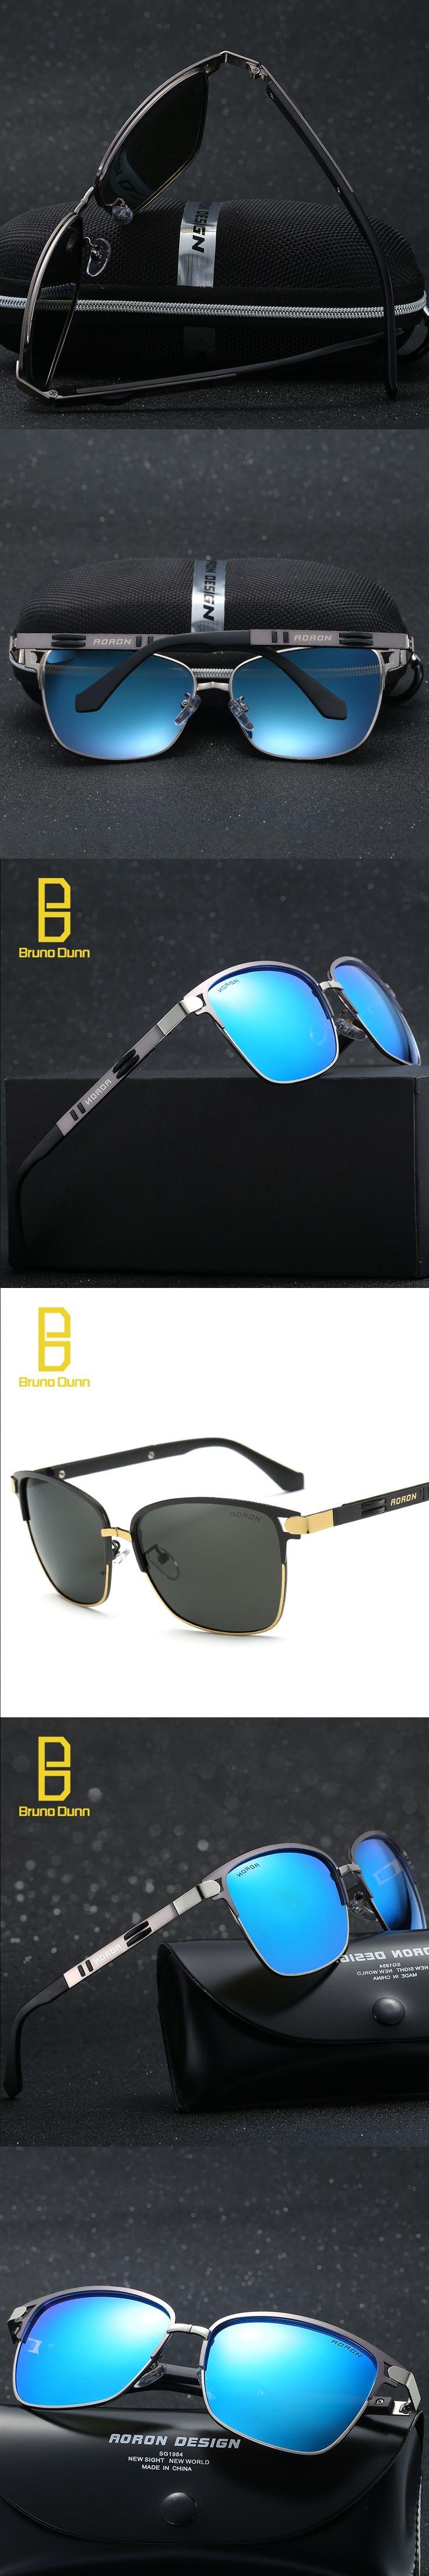 2017 Vintage Brand Luxury Aluminum Magnesium Alloy Polarized Sunglasses Men fishing Glasses HD Polarized oculos de sol feminino